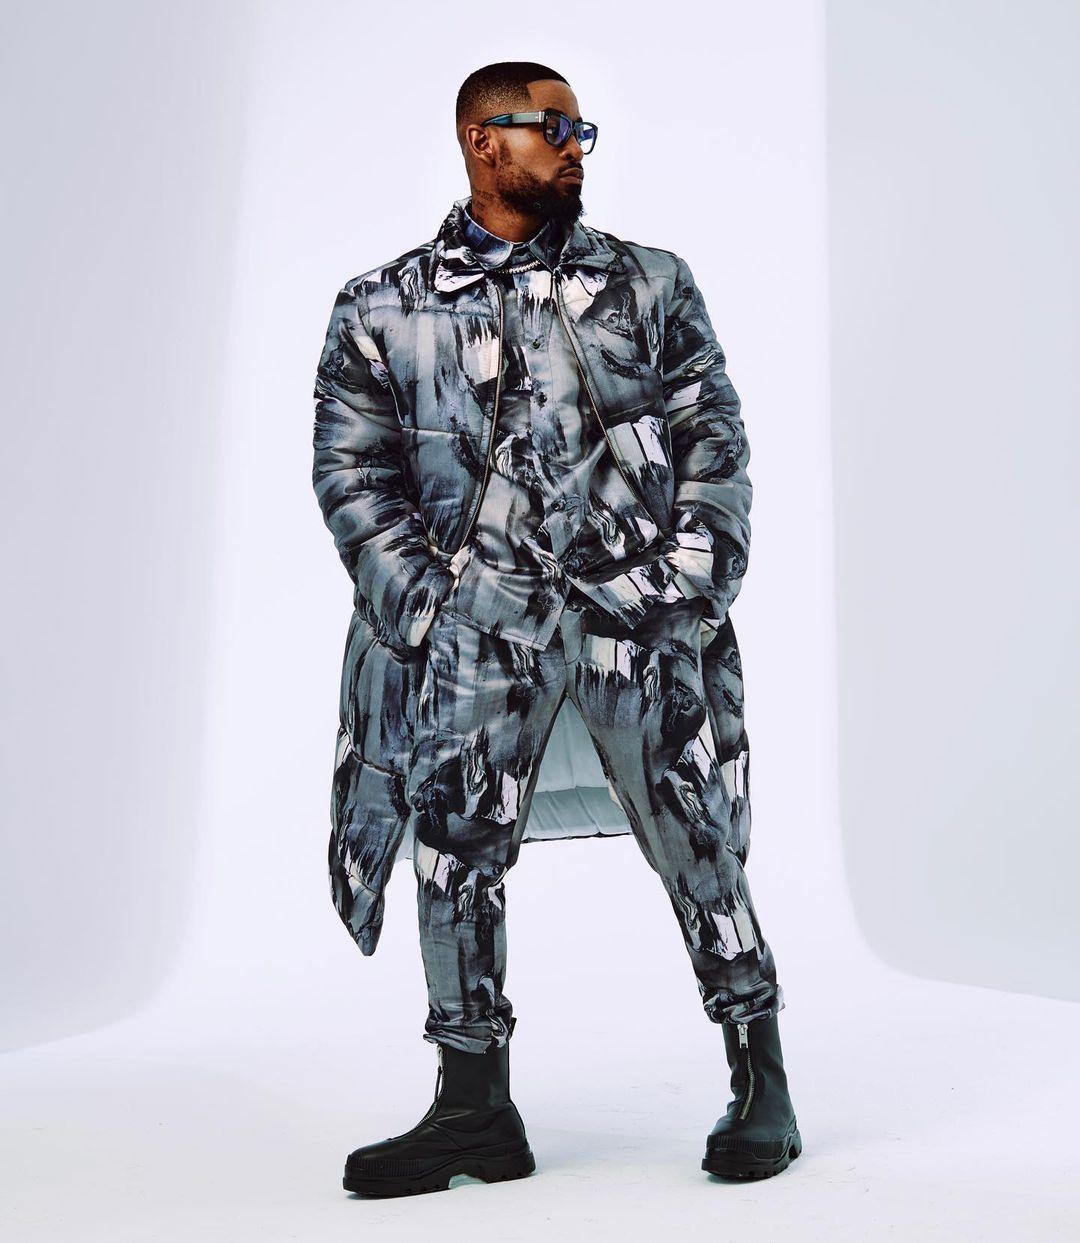 best-dressed-black-male-celebrities-world-menswear-style-rave